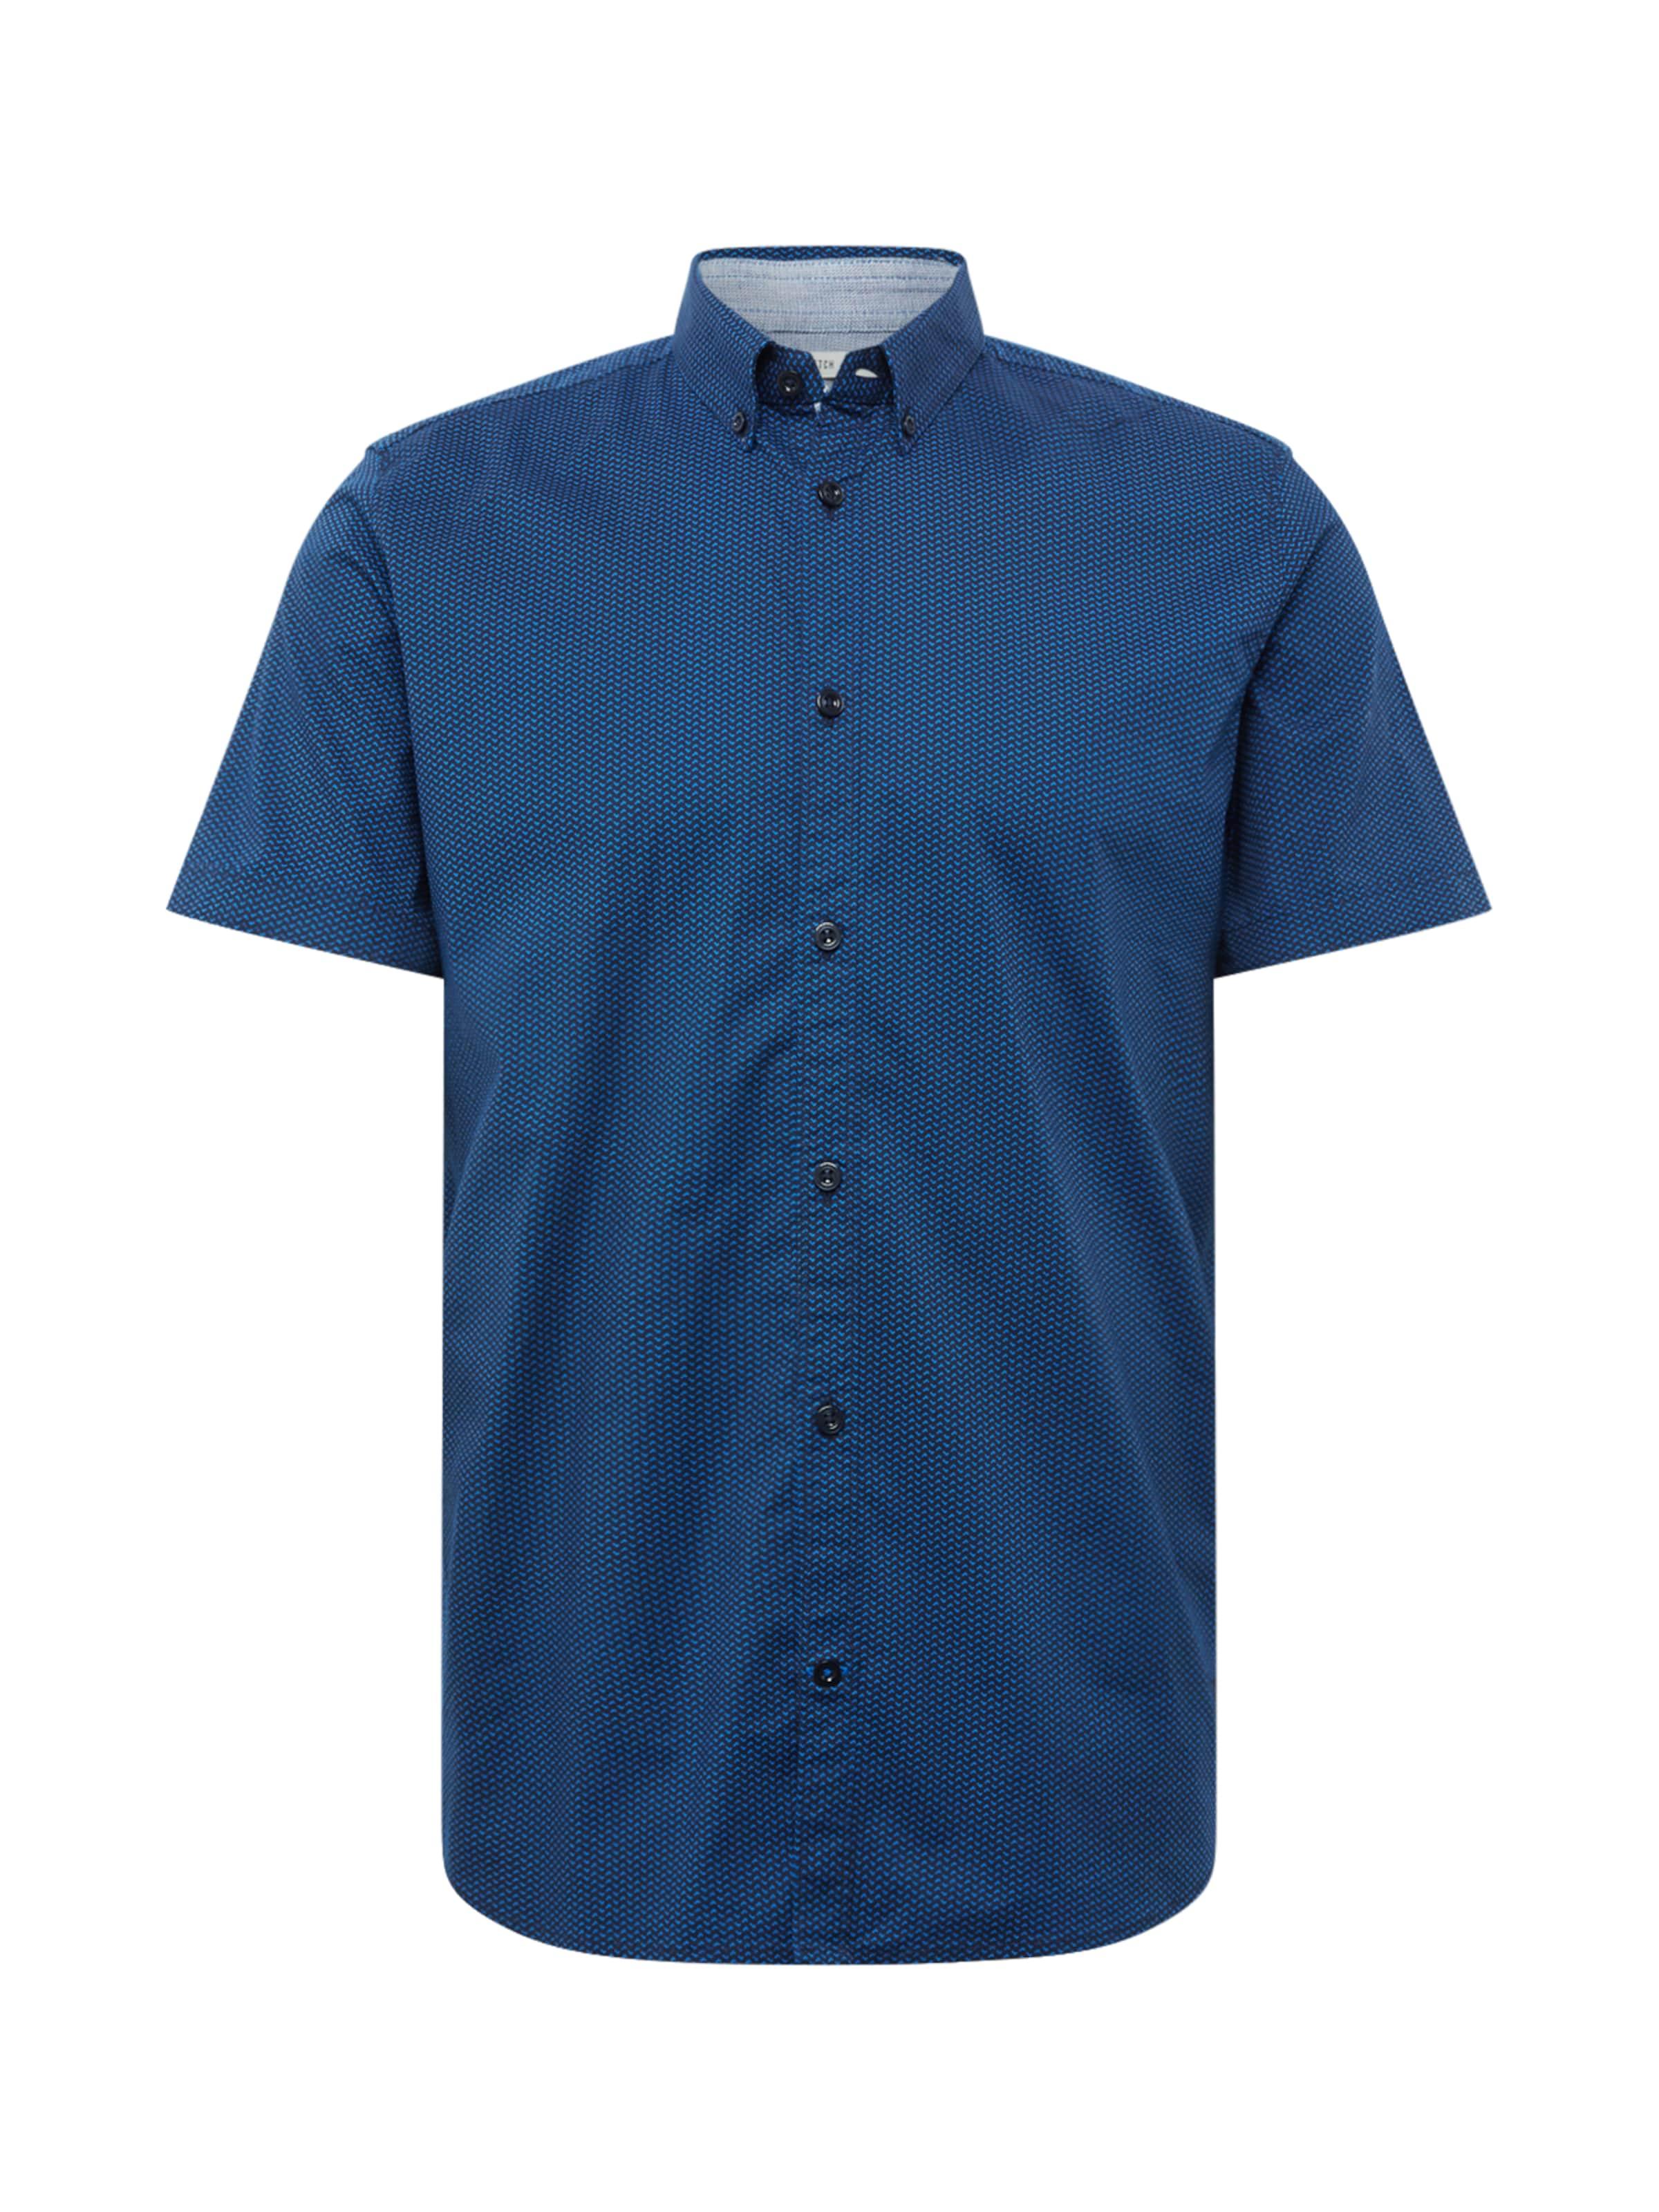 Tailor Marine Tom En Chemise Bleu UzVSMp